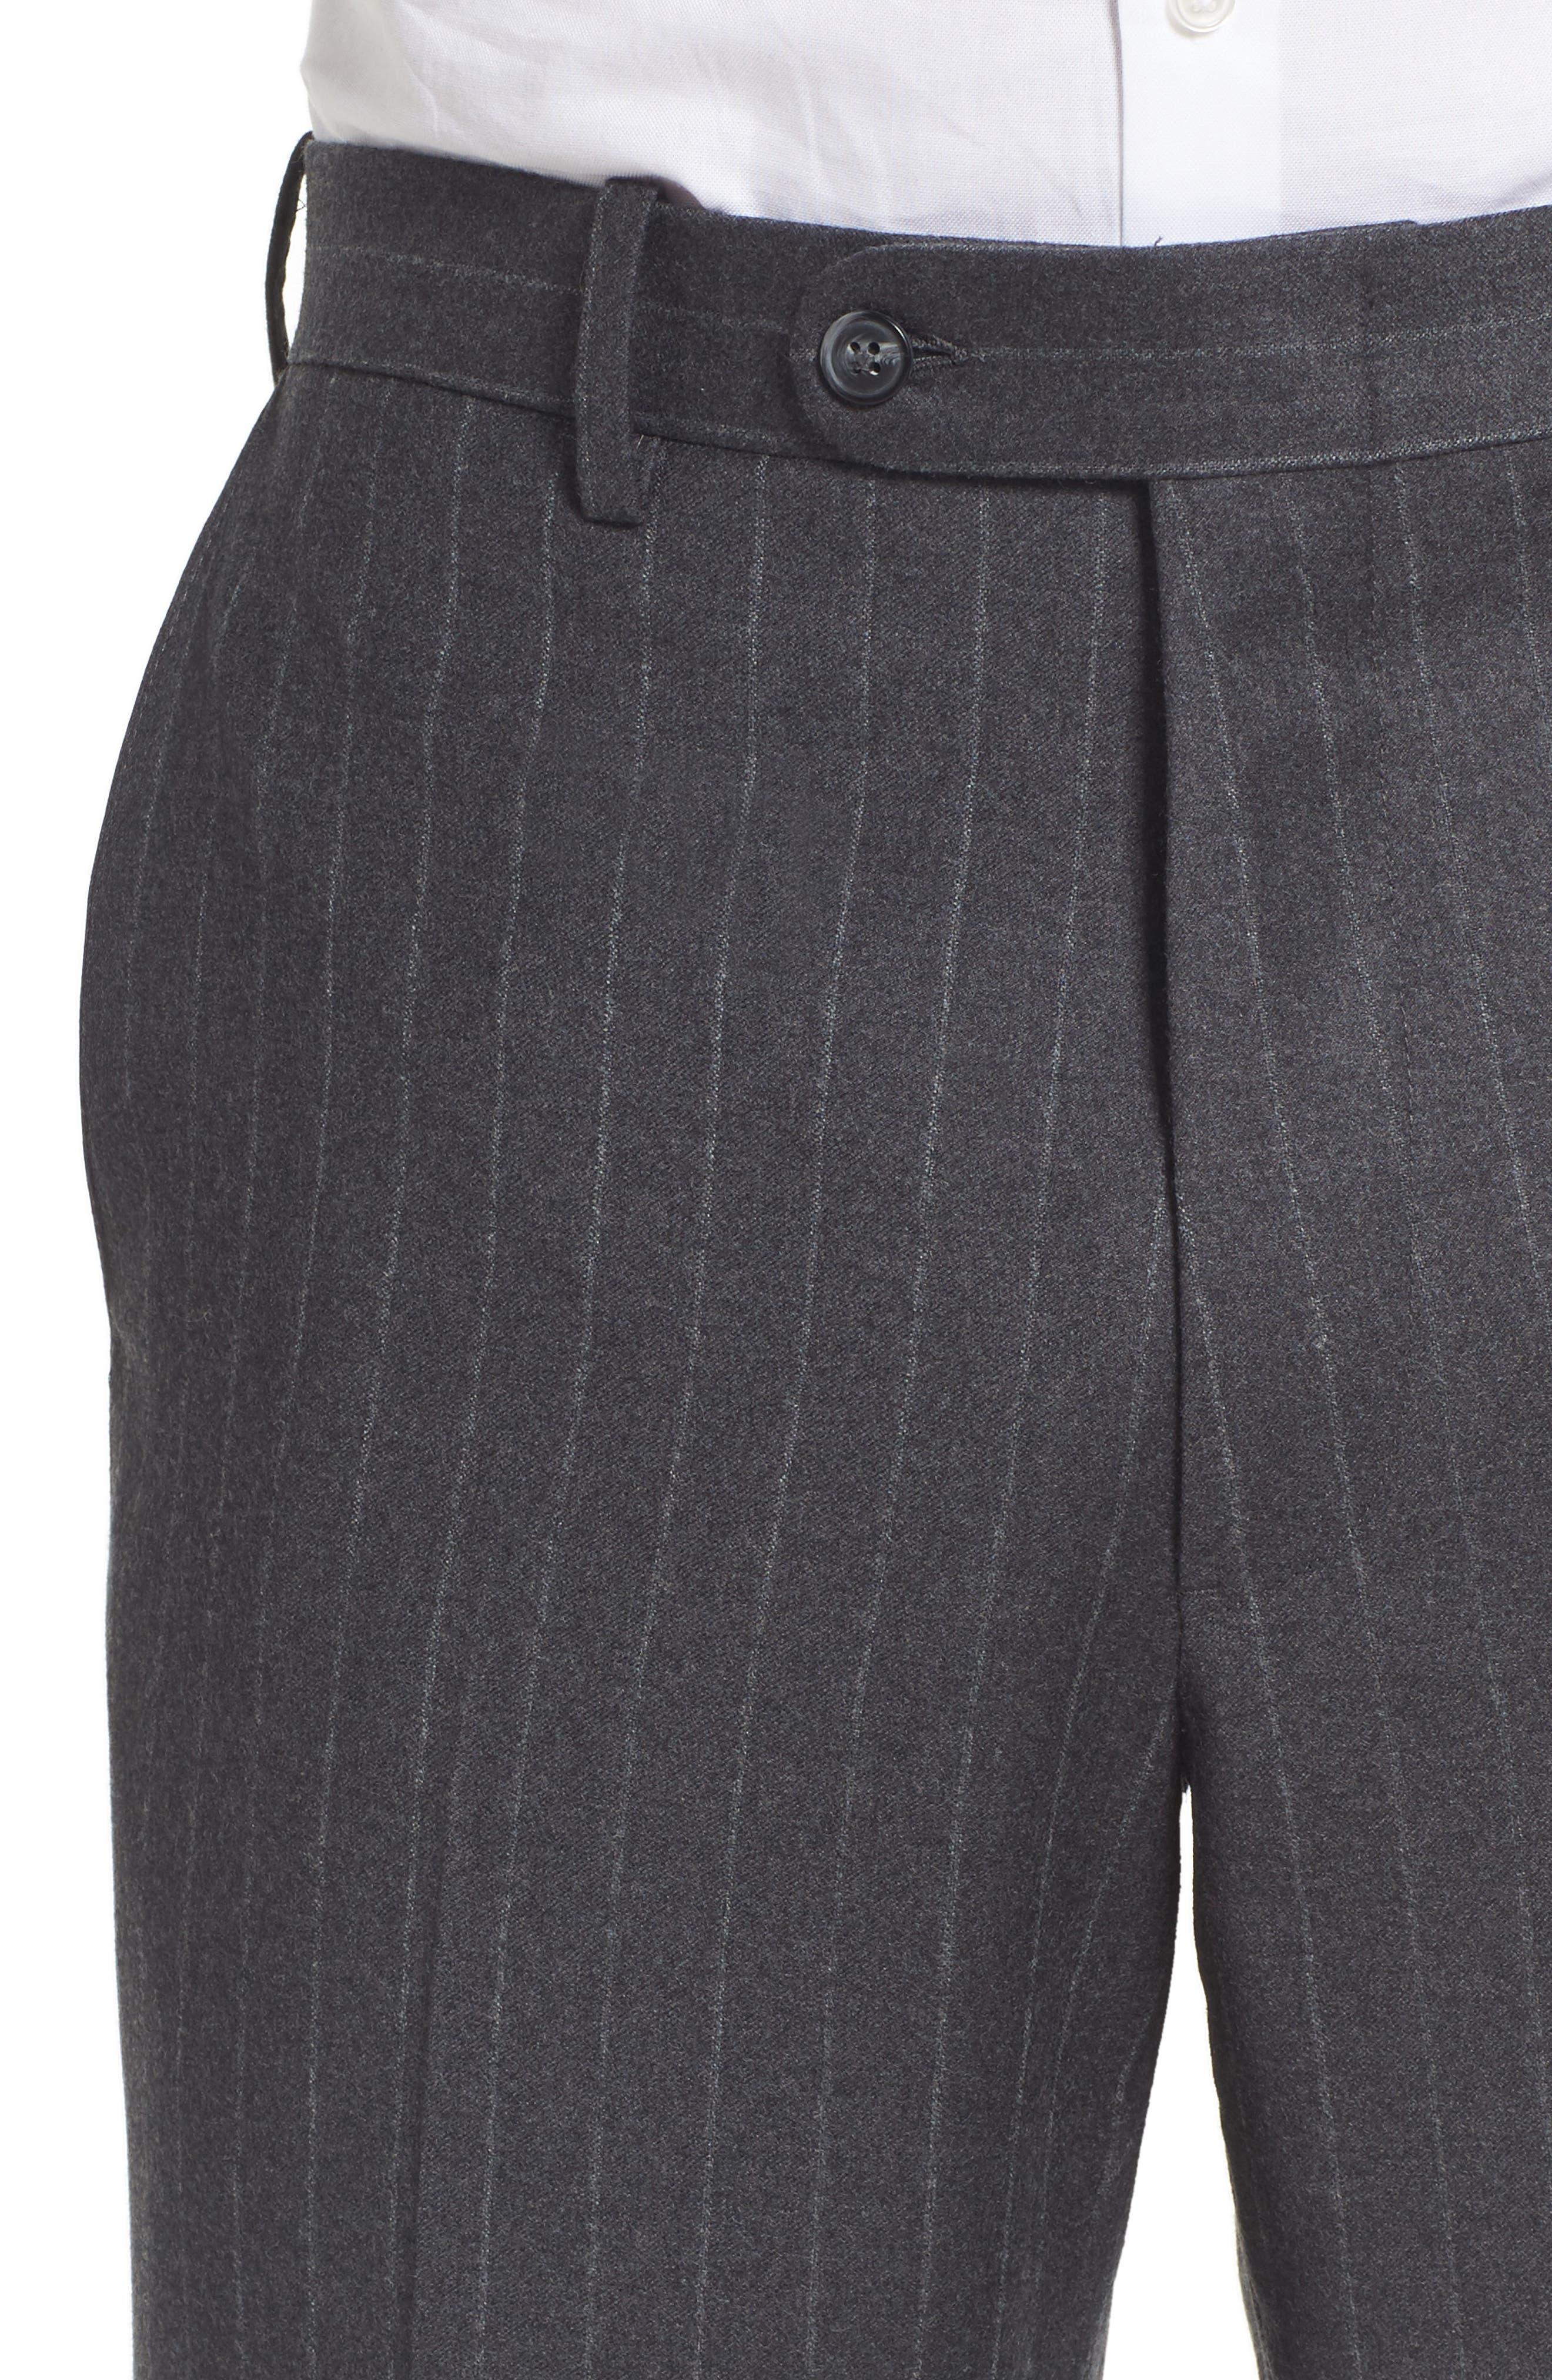 Flat Front Chalk Stripe Wool Trousers,                             Alternate thumbnail 5, color,                             030